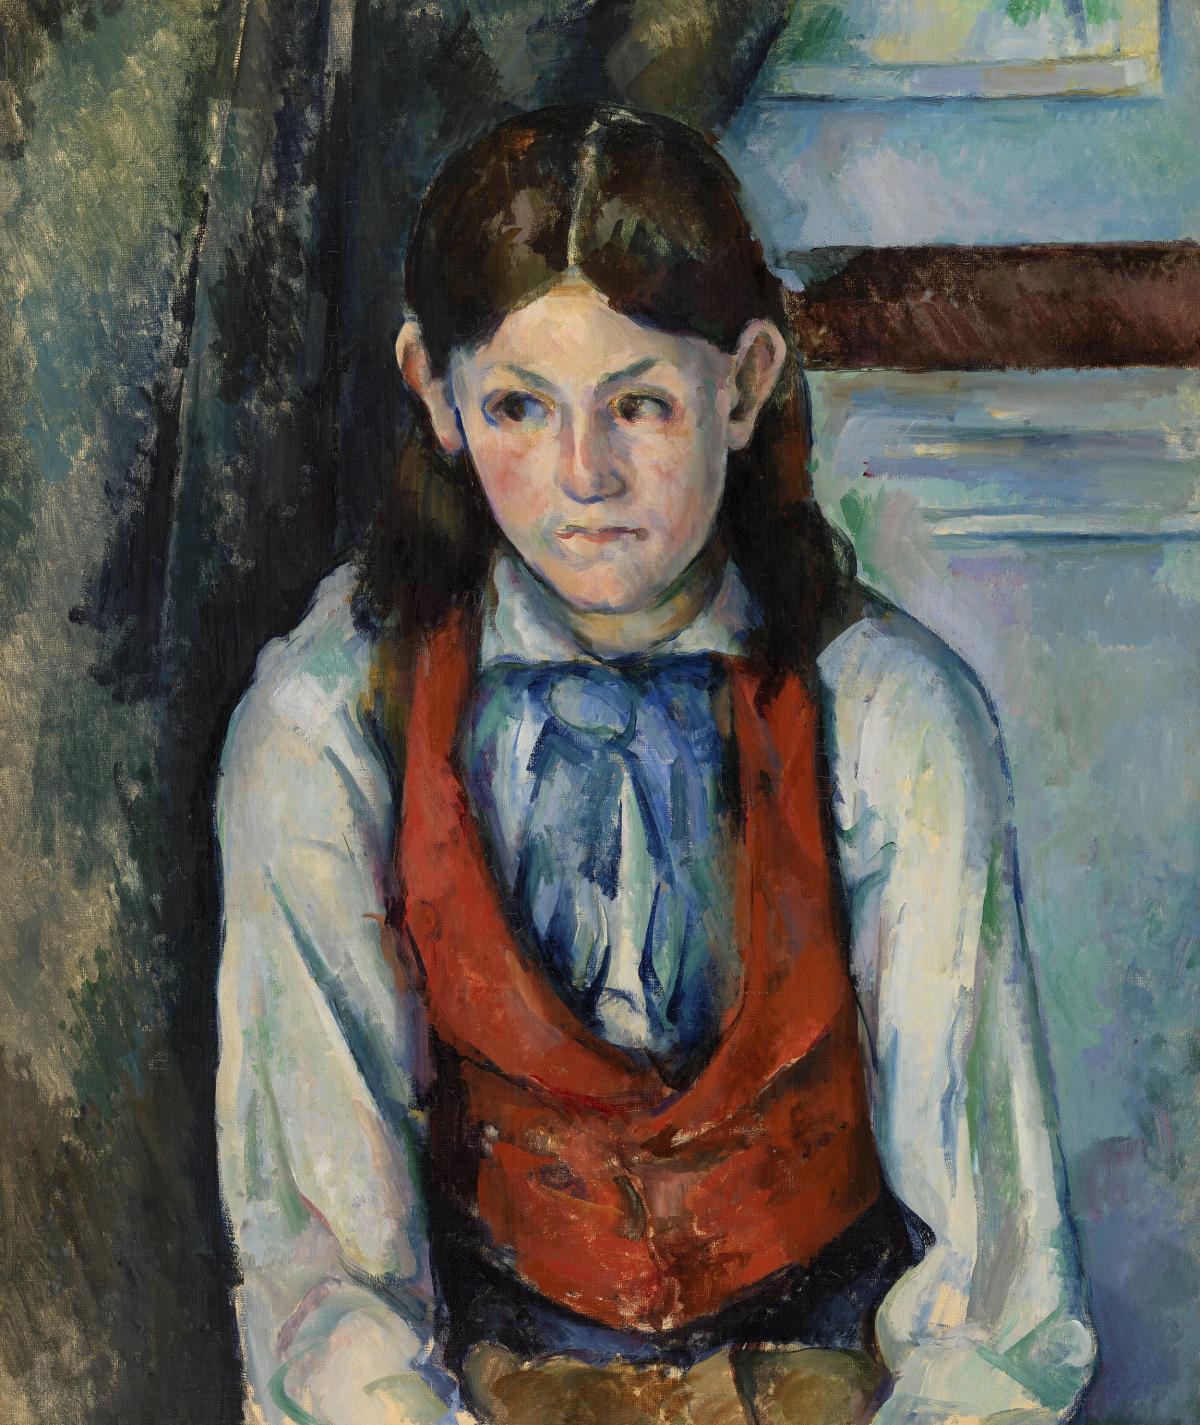 Boy in a Red Vest (Le Garçon au gilet rouge) (ca. 1888–1890) by Paul Cézanne. Original from Original from Barnes Foundation.  #426033